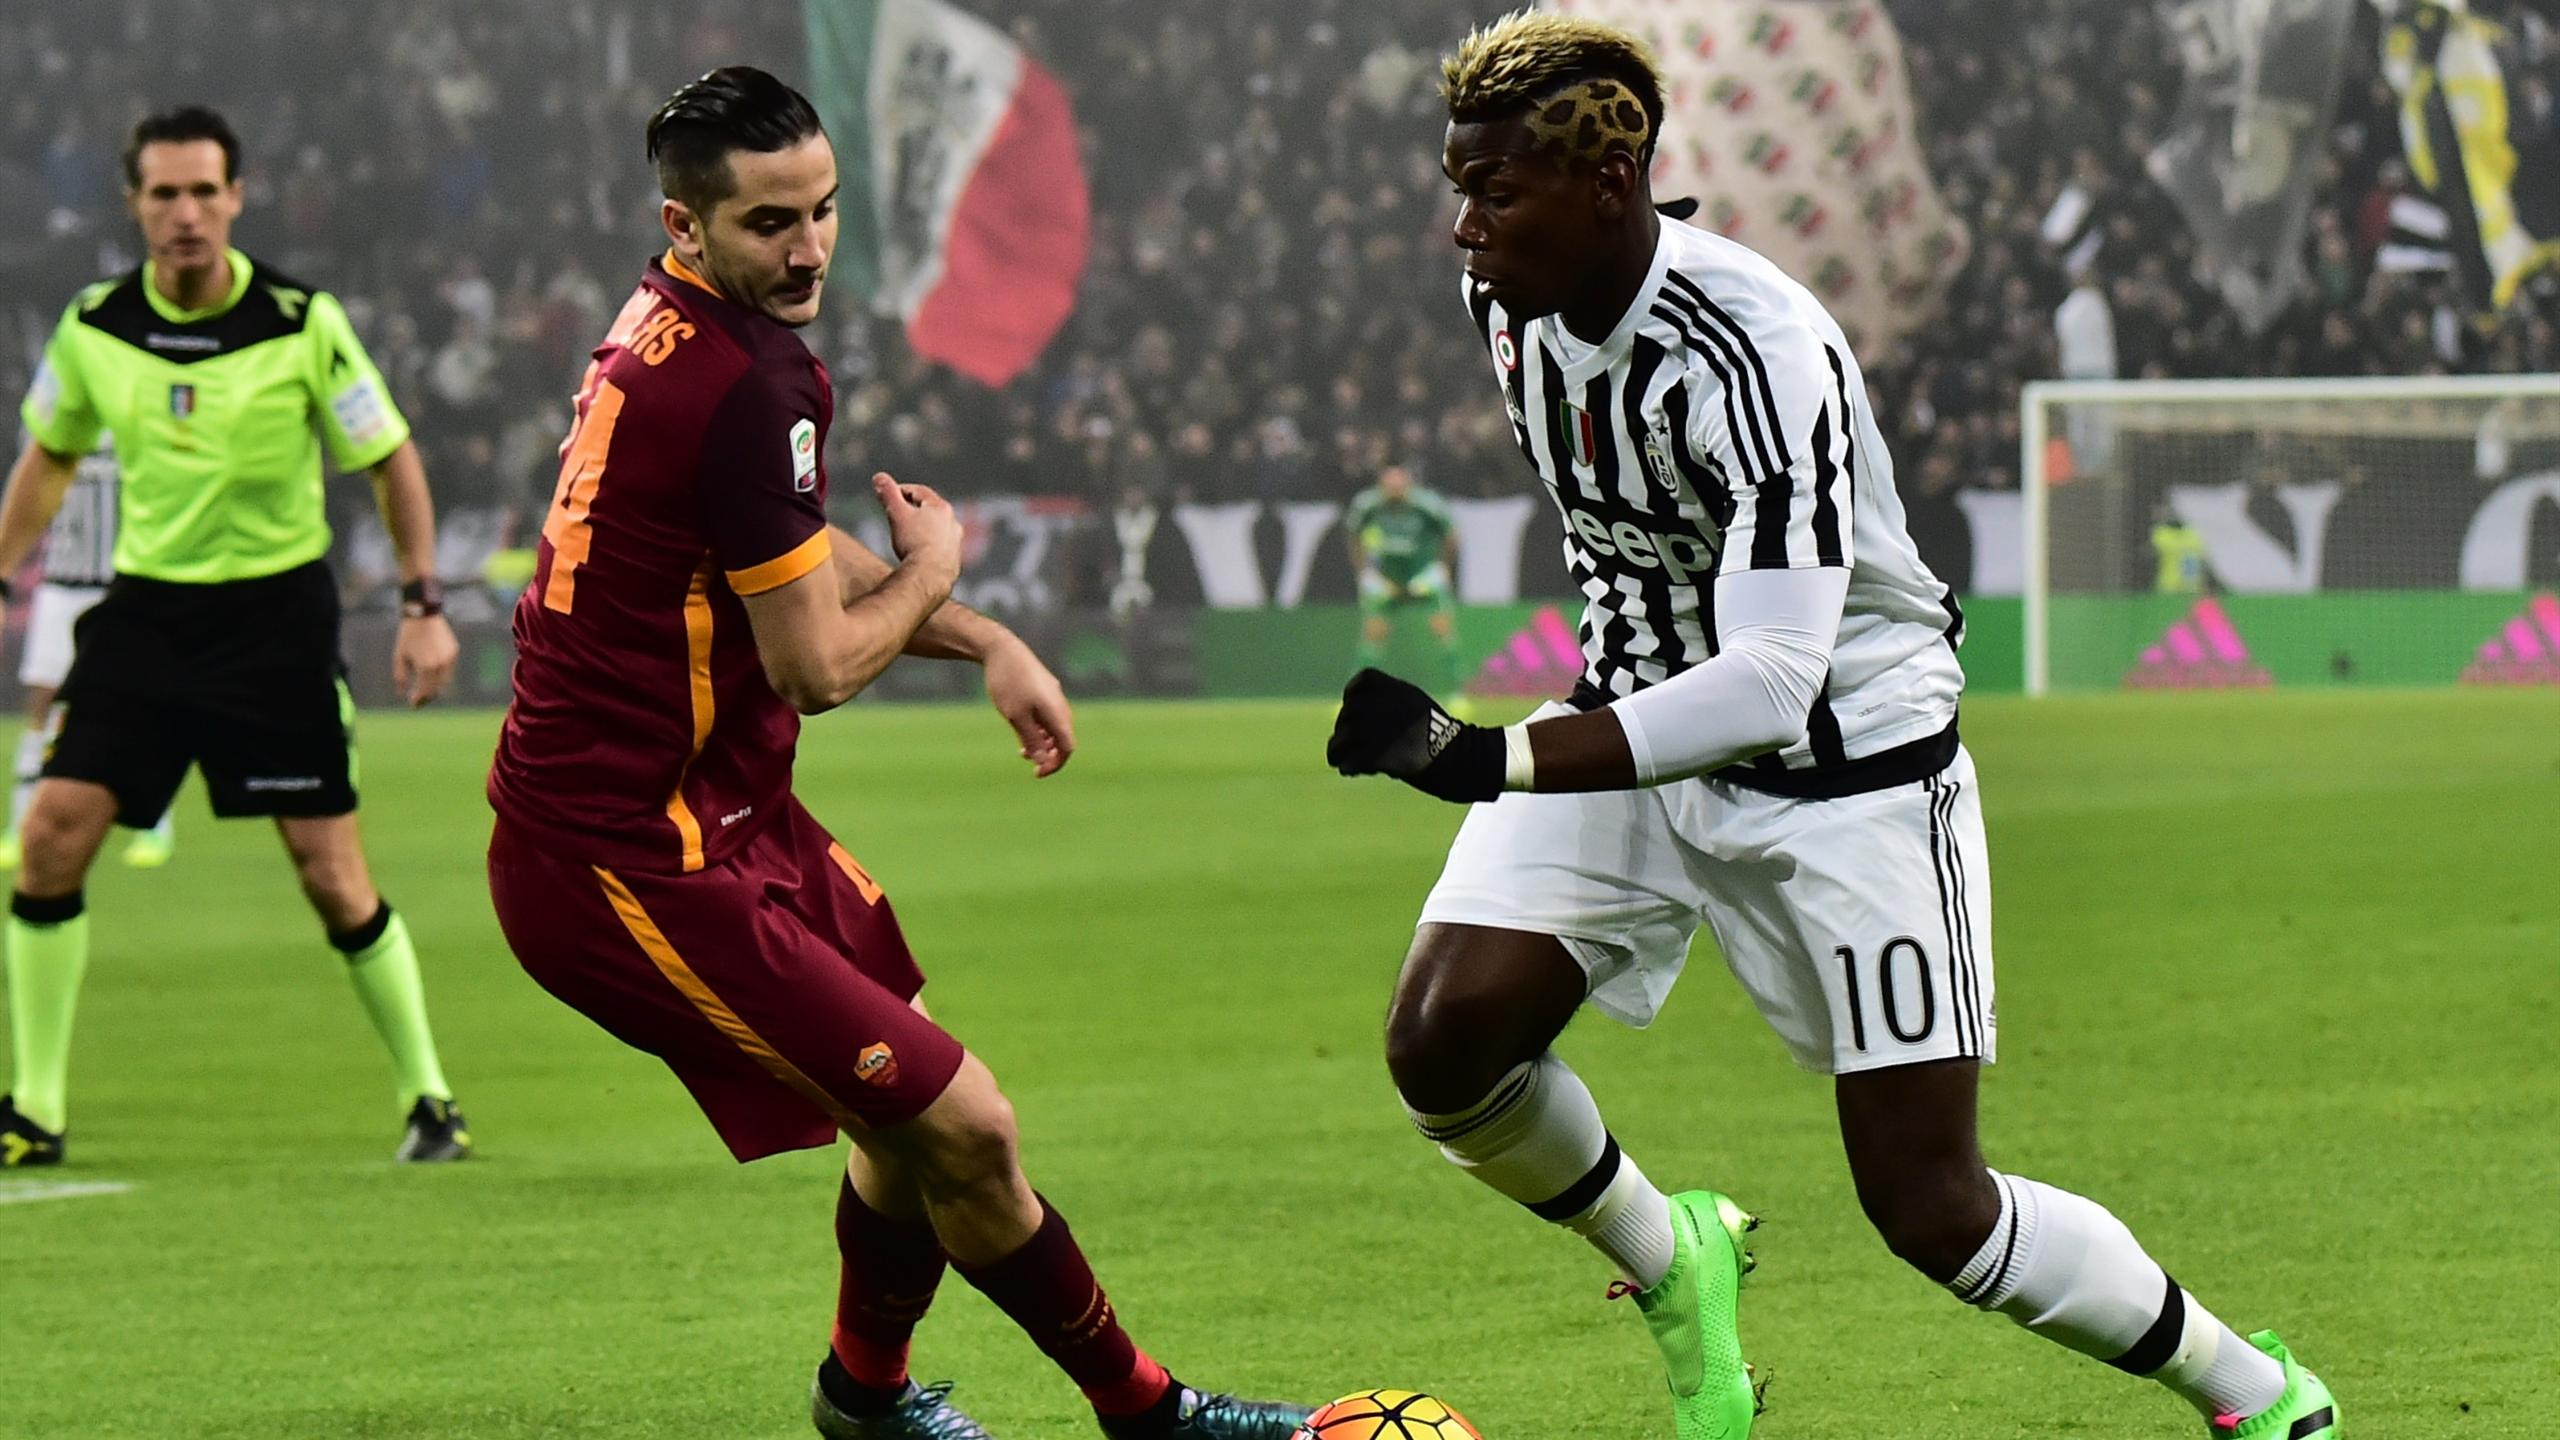 Eurosport FootballPaul T Avec A Il Pogba AdidasEconomie Signé nOXPkw80